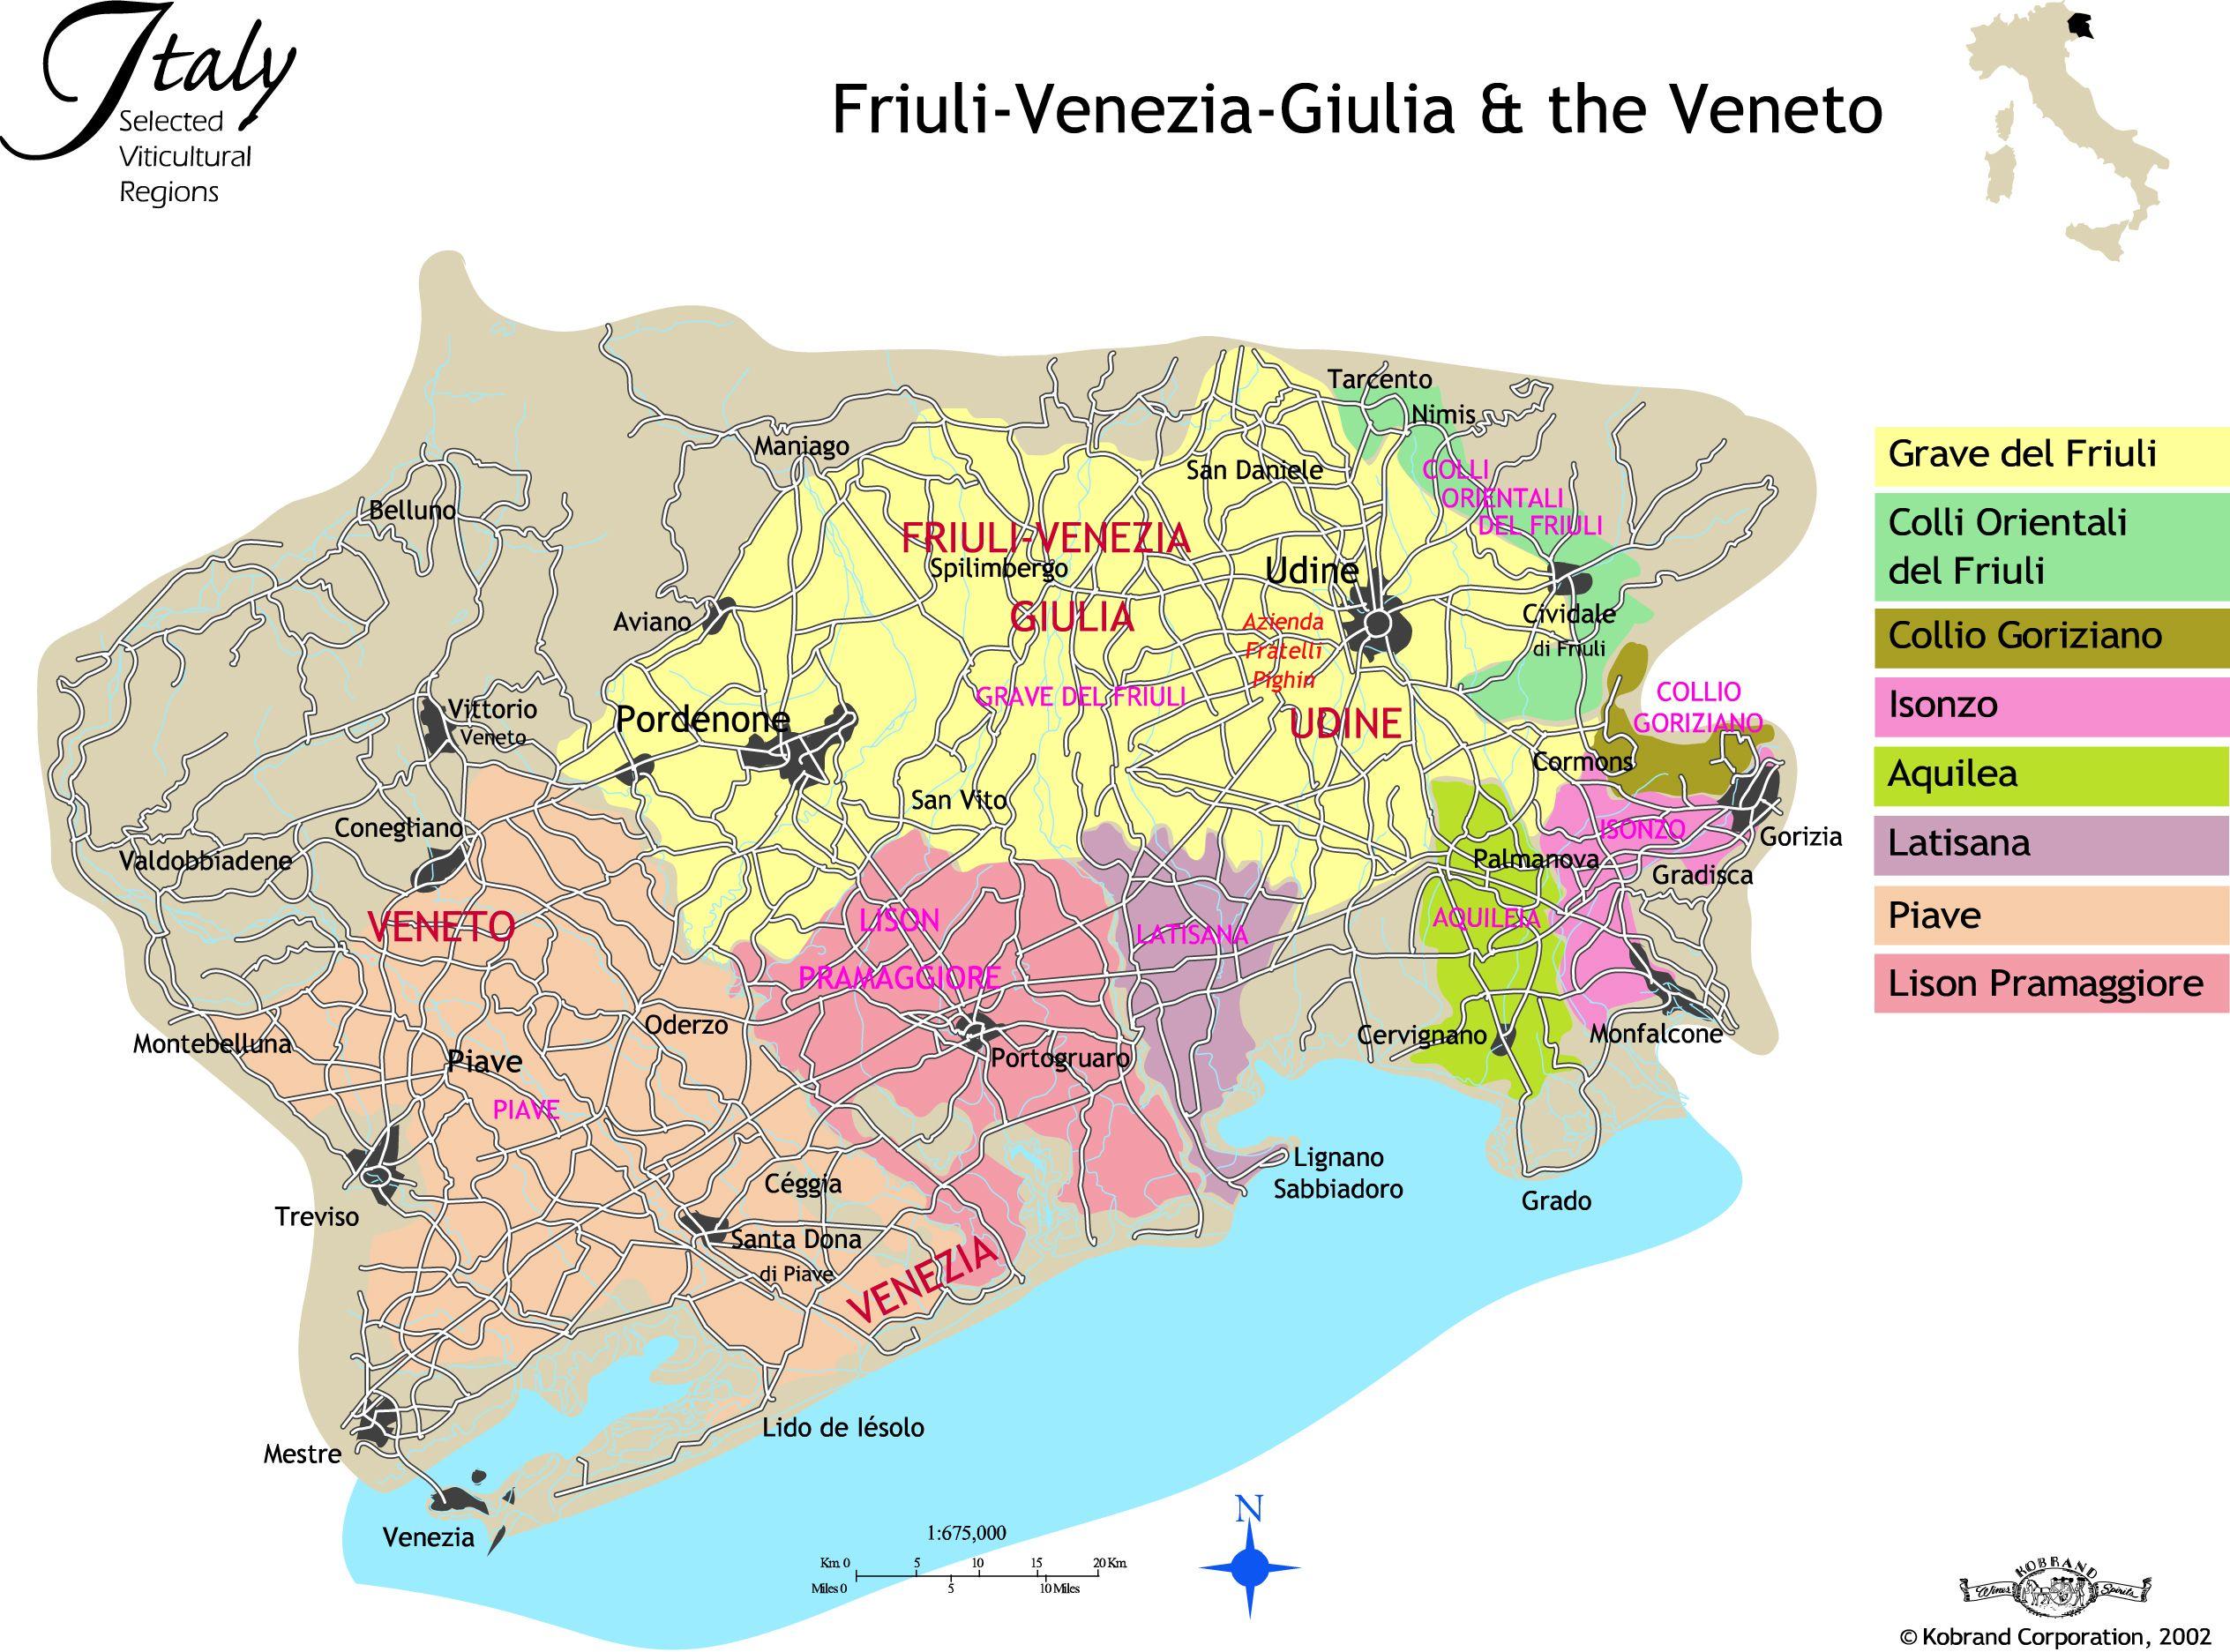 FriuliVenezia Giulia and the Veneto Les vins italiens Italian